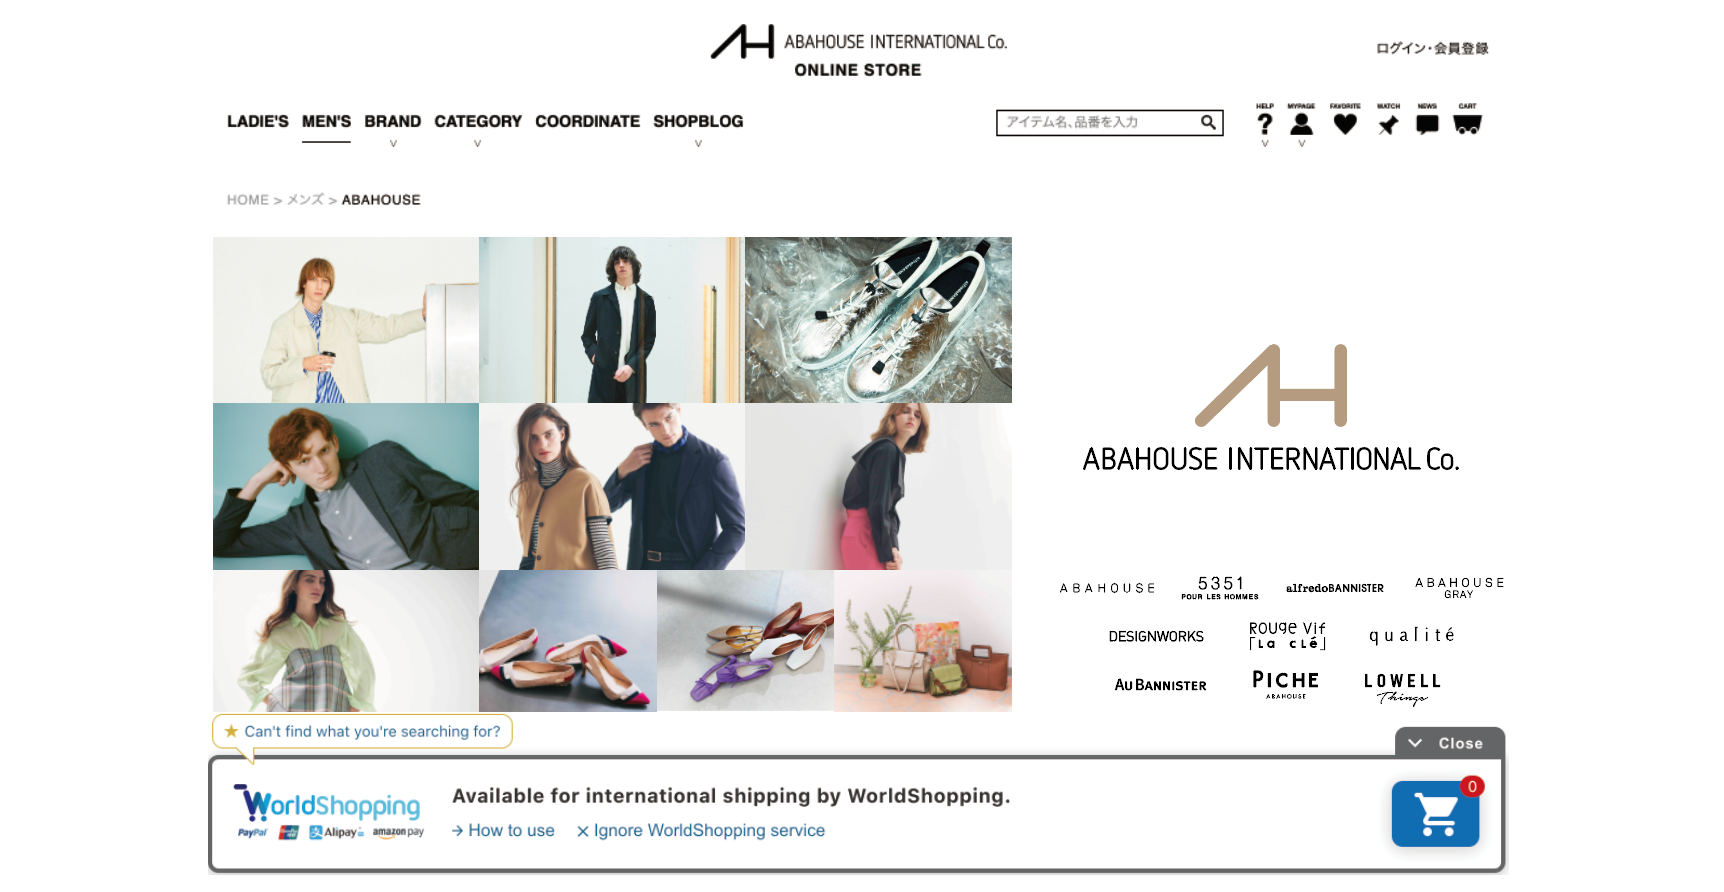 ABAHOUSEサイト内イメージ